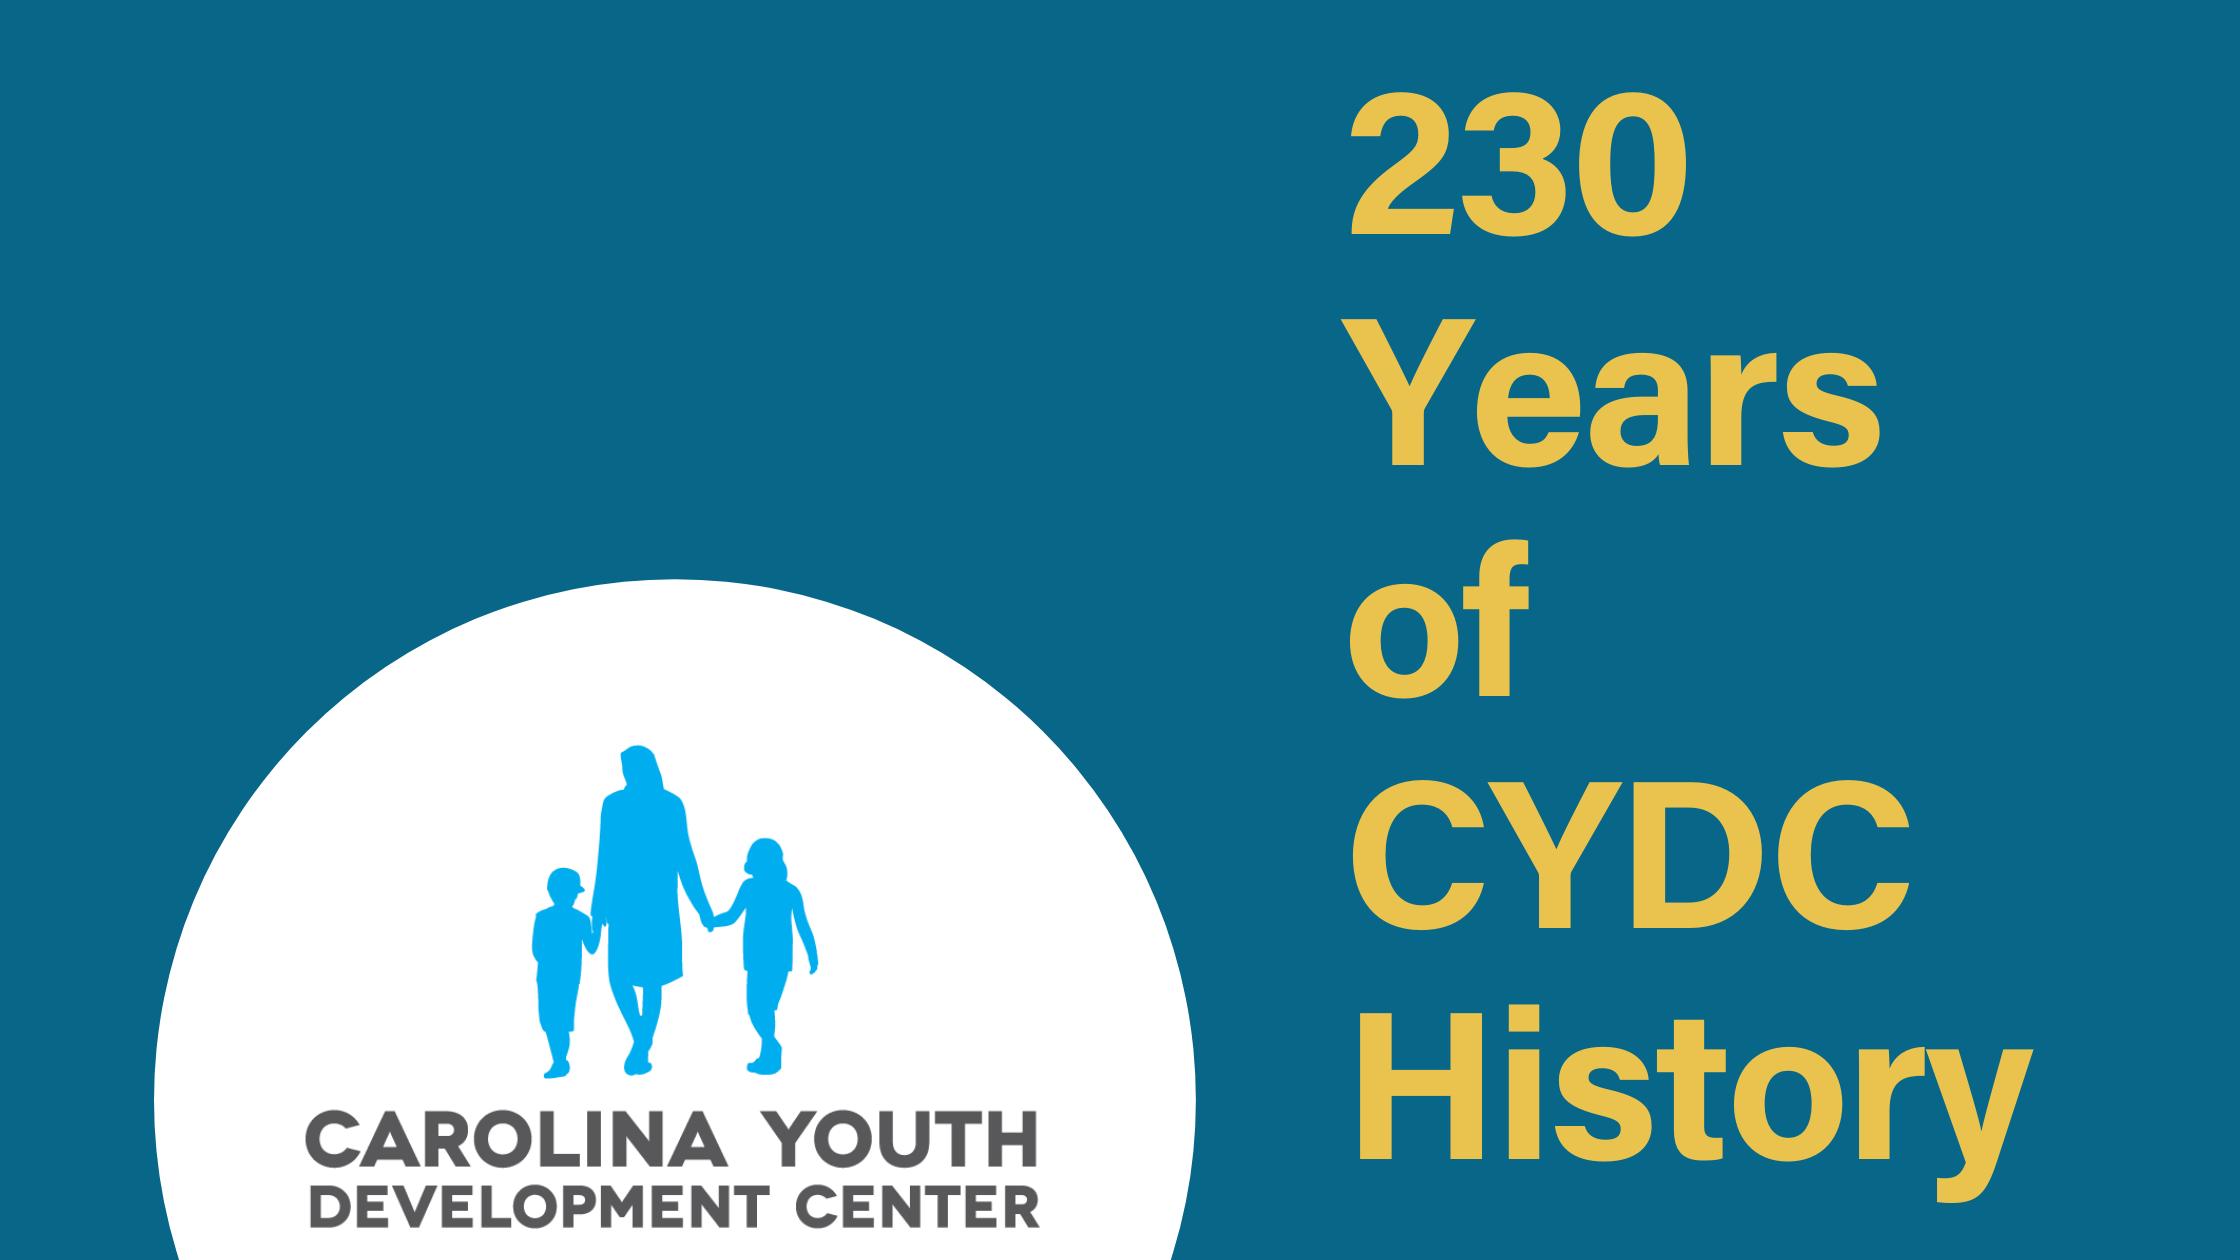 Celebrating 230 Years of History